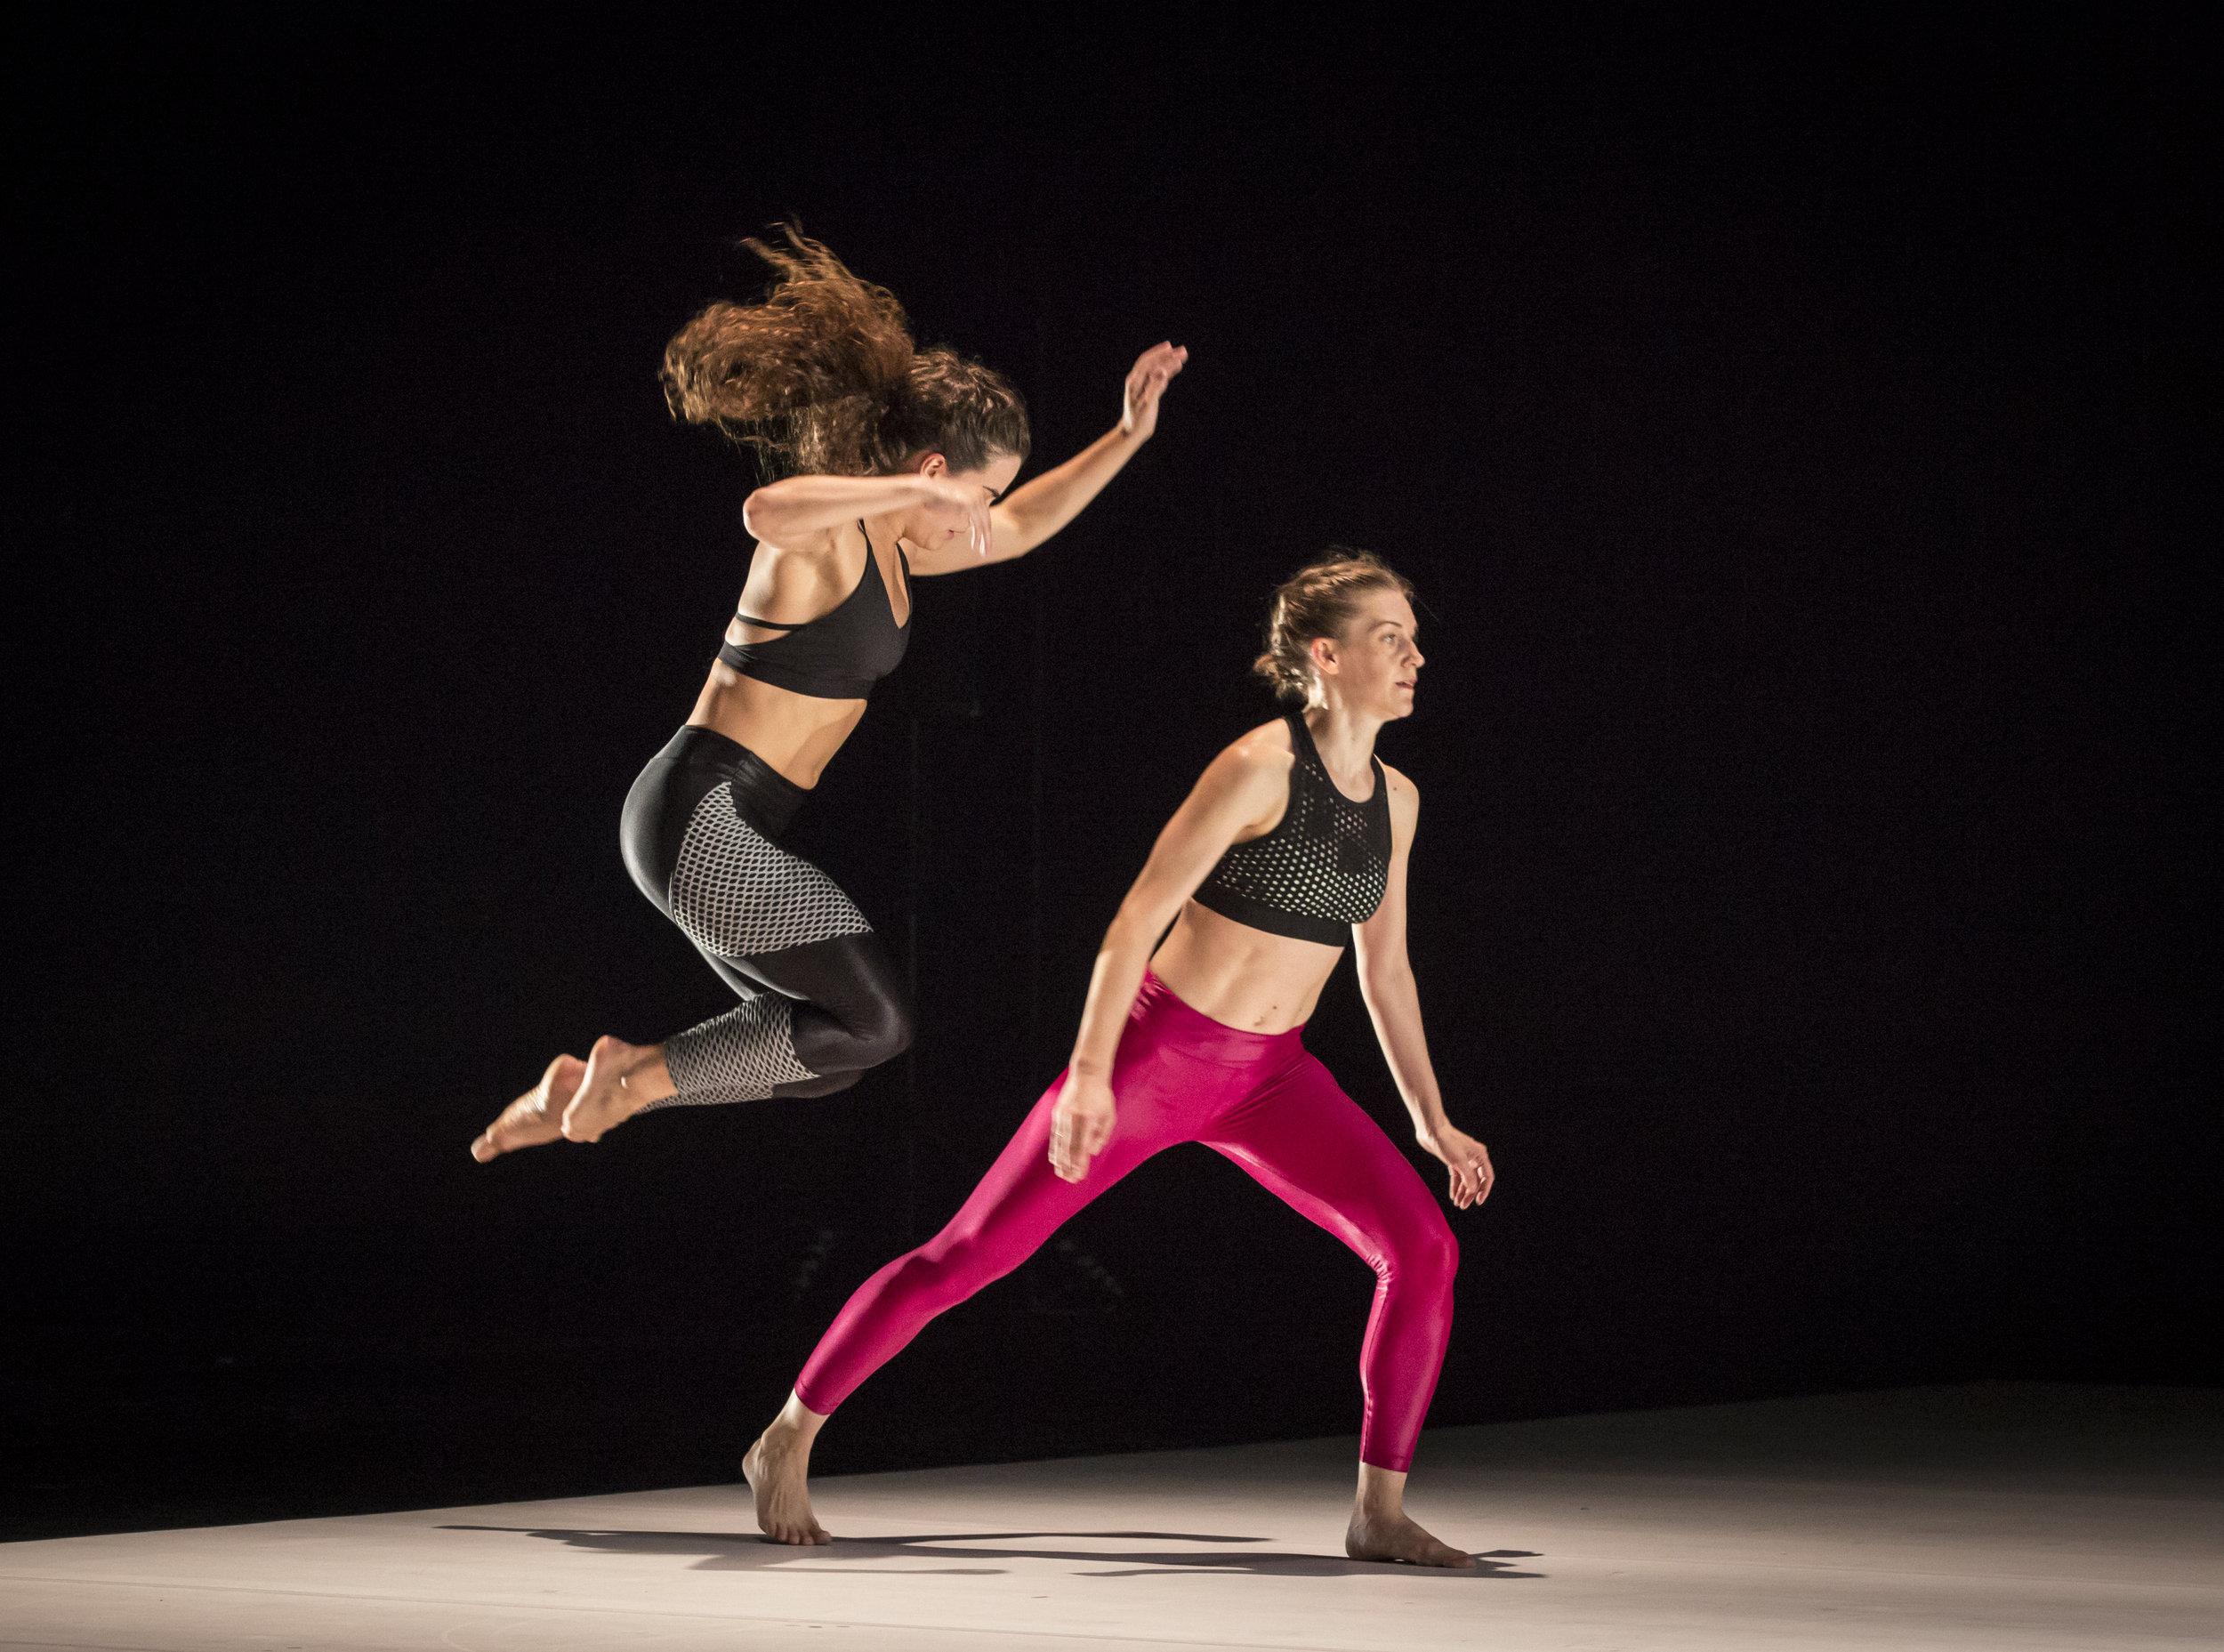 photos by Marina Levitskaya, courtesy of Peak Performances @ Montclair State University